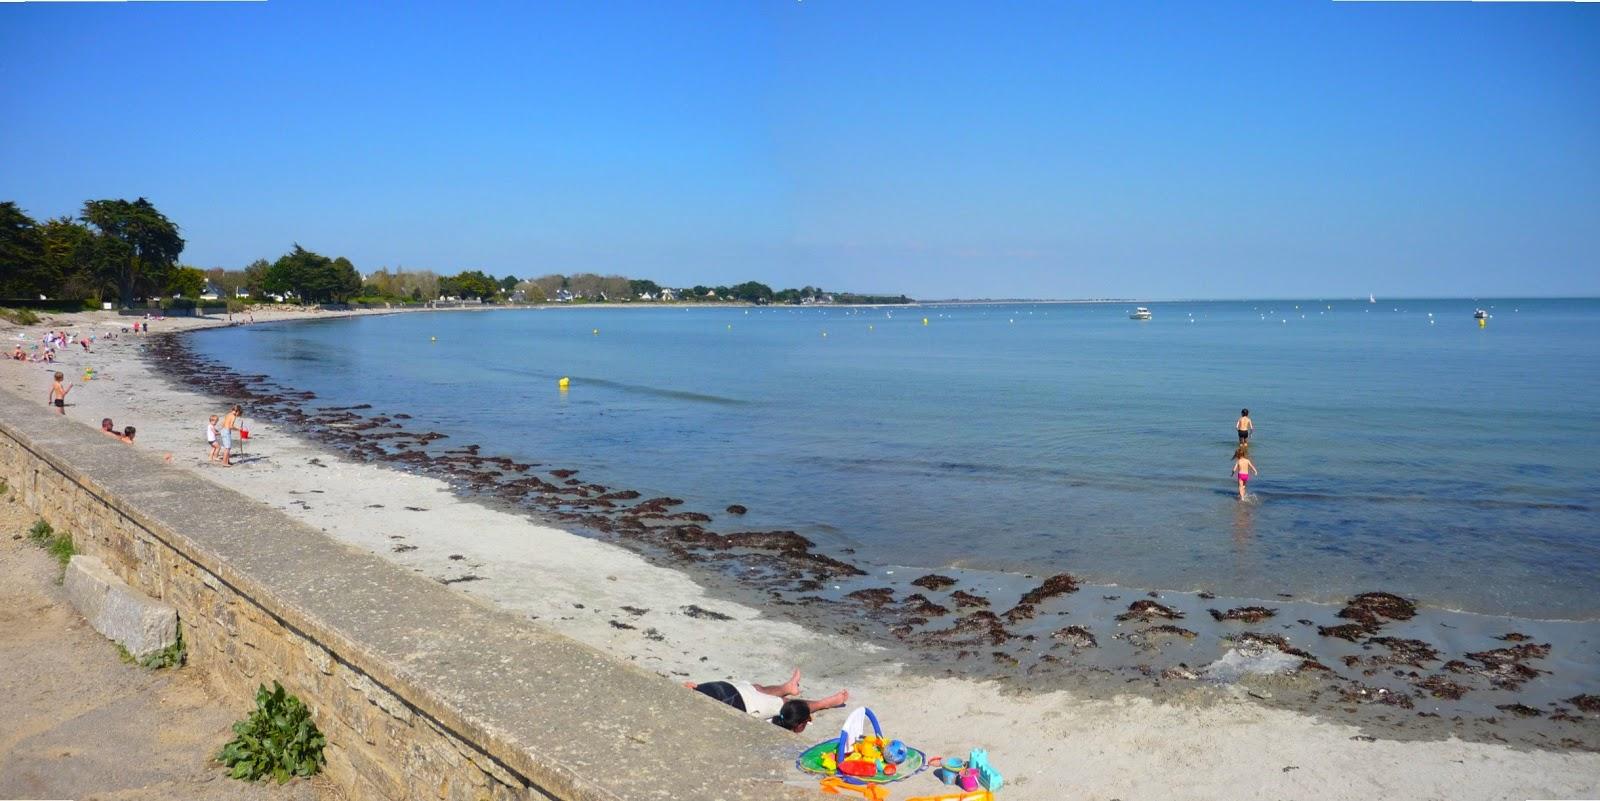 La presqu 39 le de rhuys et le golfe du morbihan la presqu 39 le c t oc an - Port saint jacques morbihan ...